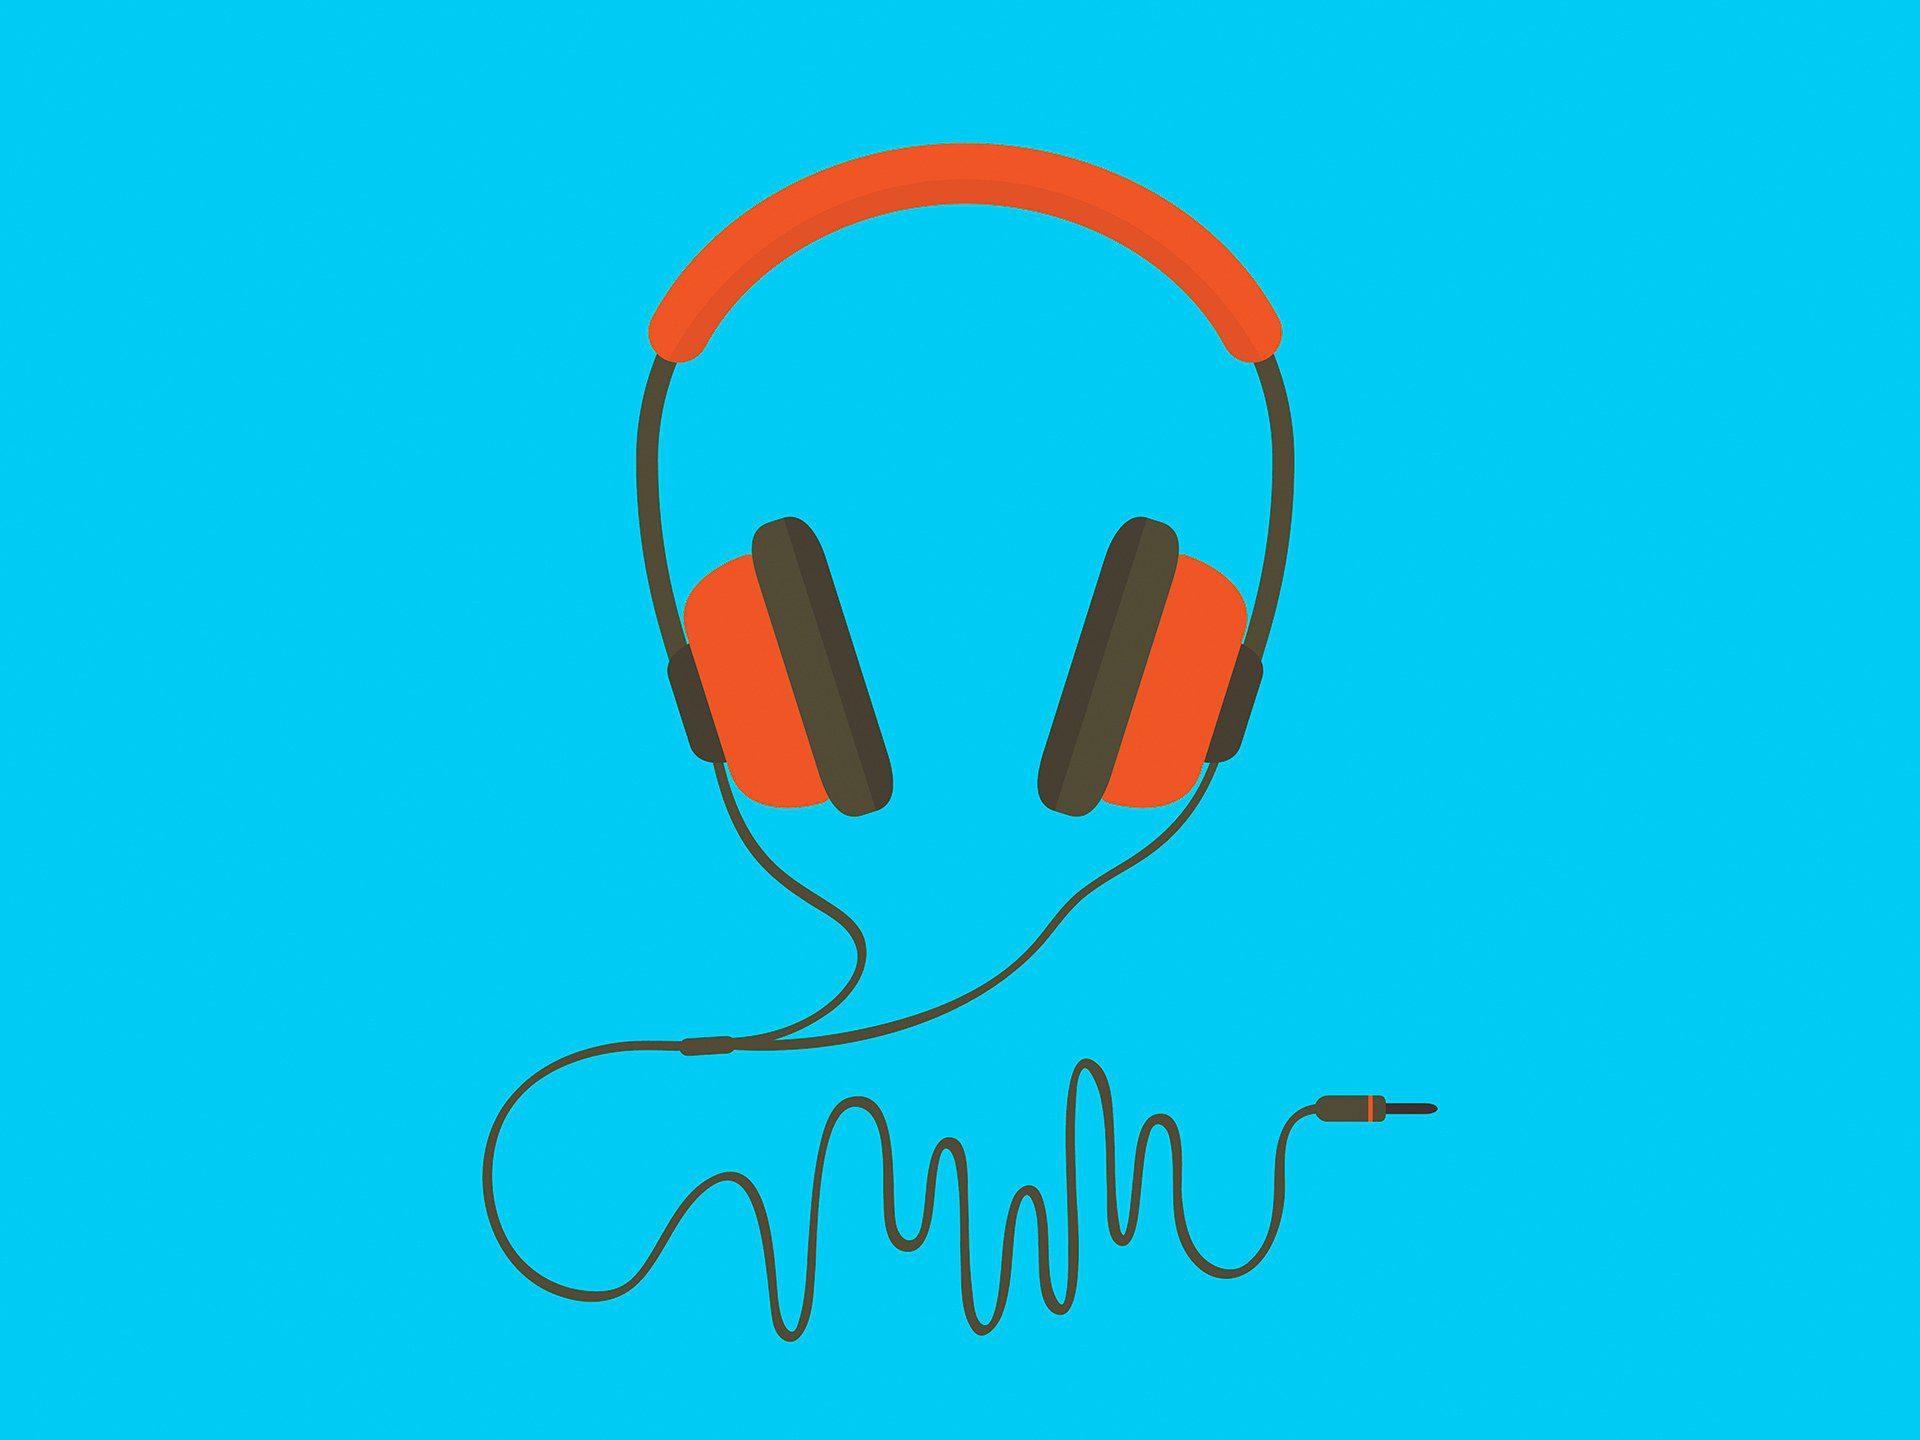 headphones-podcast-business